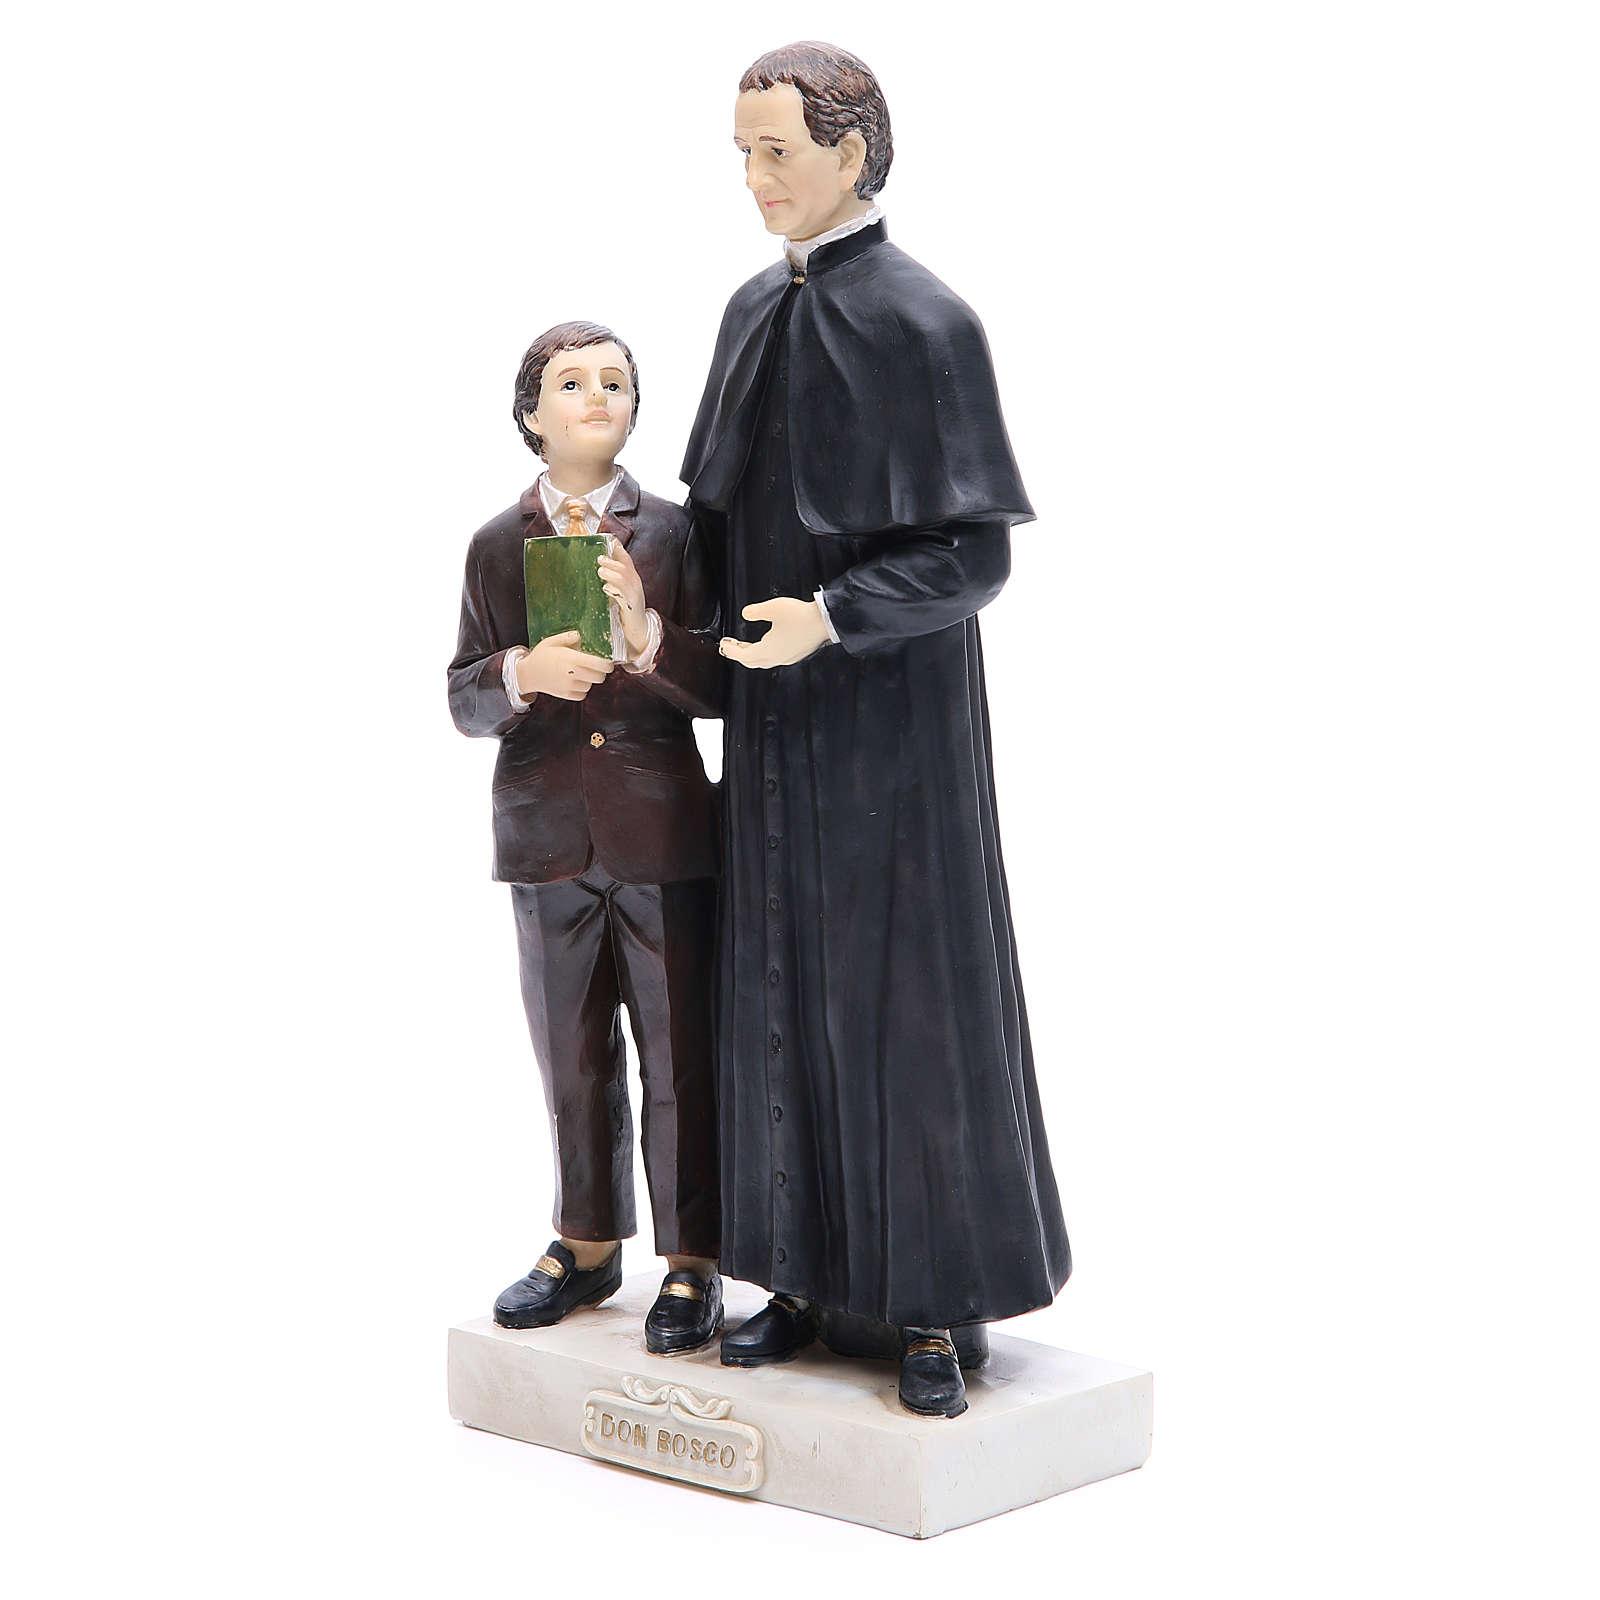 Saint John Bosco and D. Savio resin statue 12 inches 4